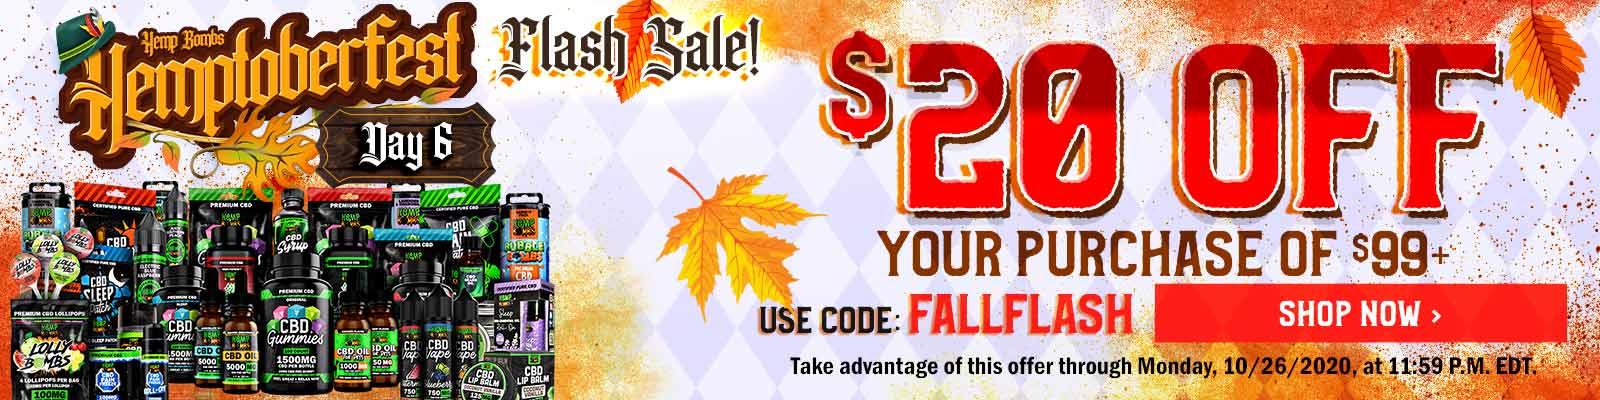 CBD Sale - Flash Sale $20 off of $99 Code: FALLFLASH